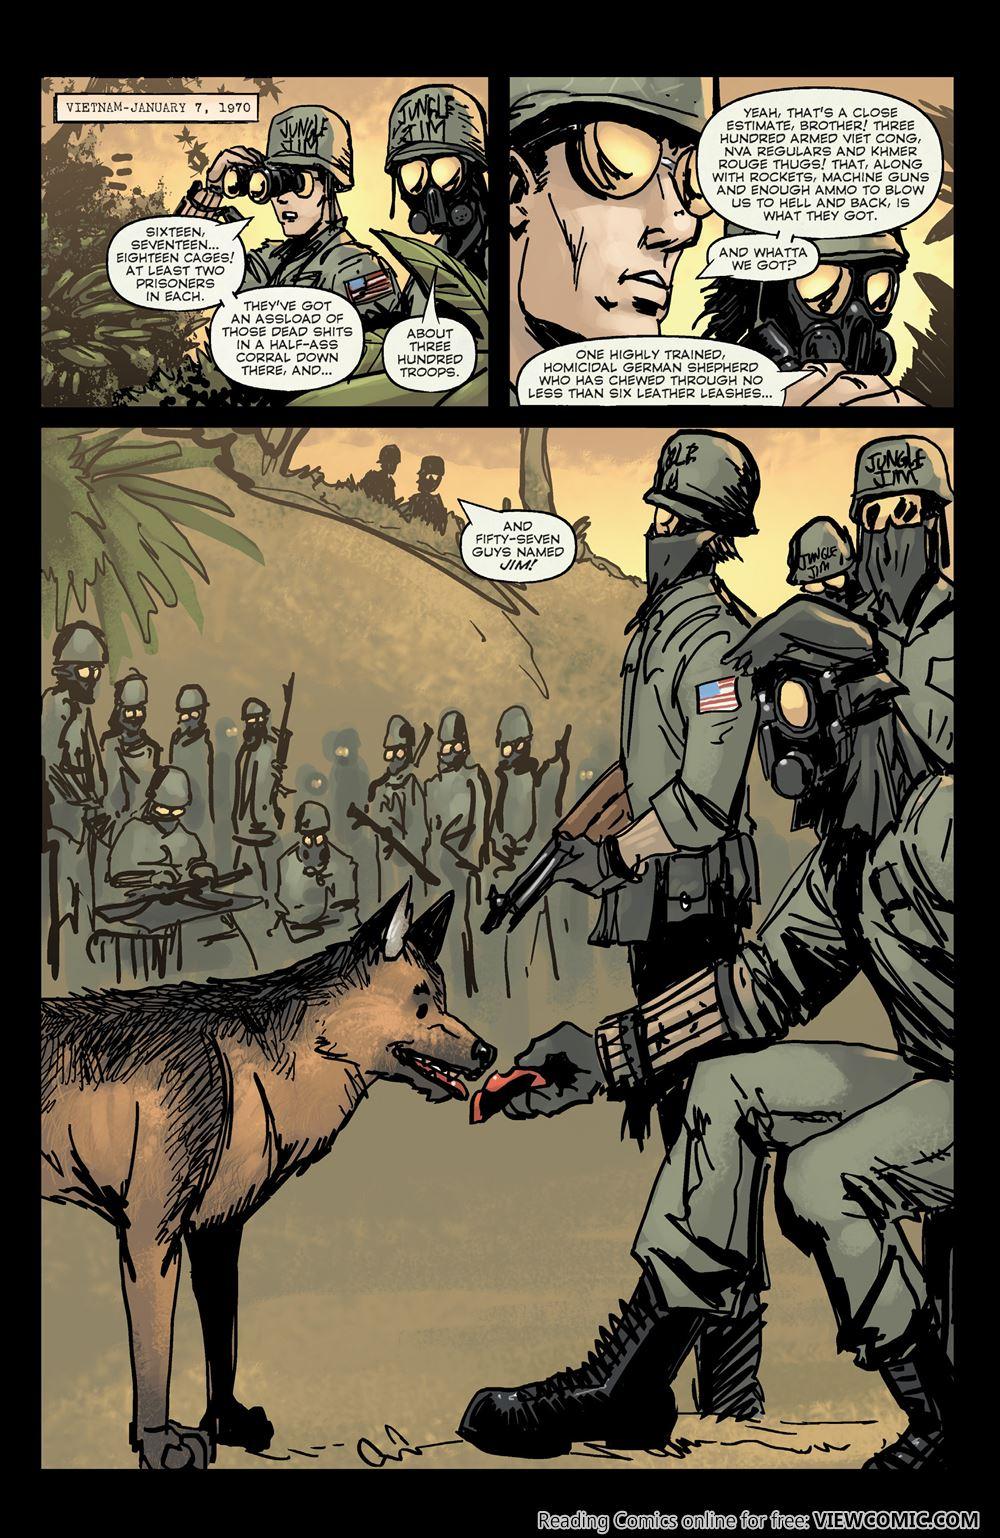 68 last rites viewcomic reading comics online for free 2018